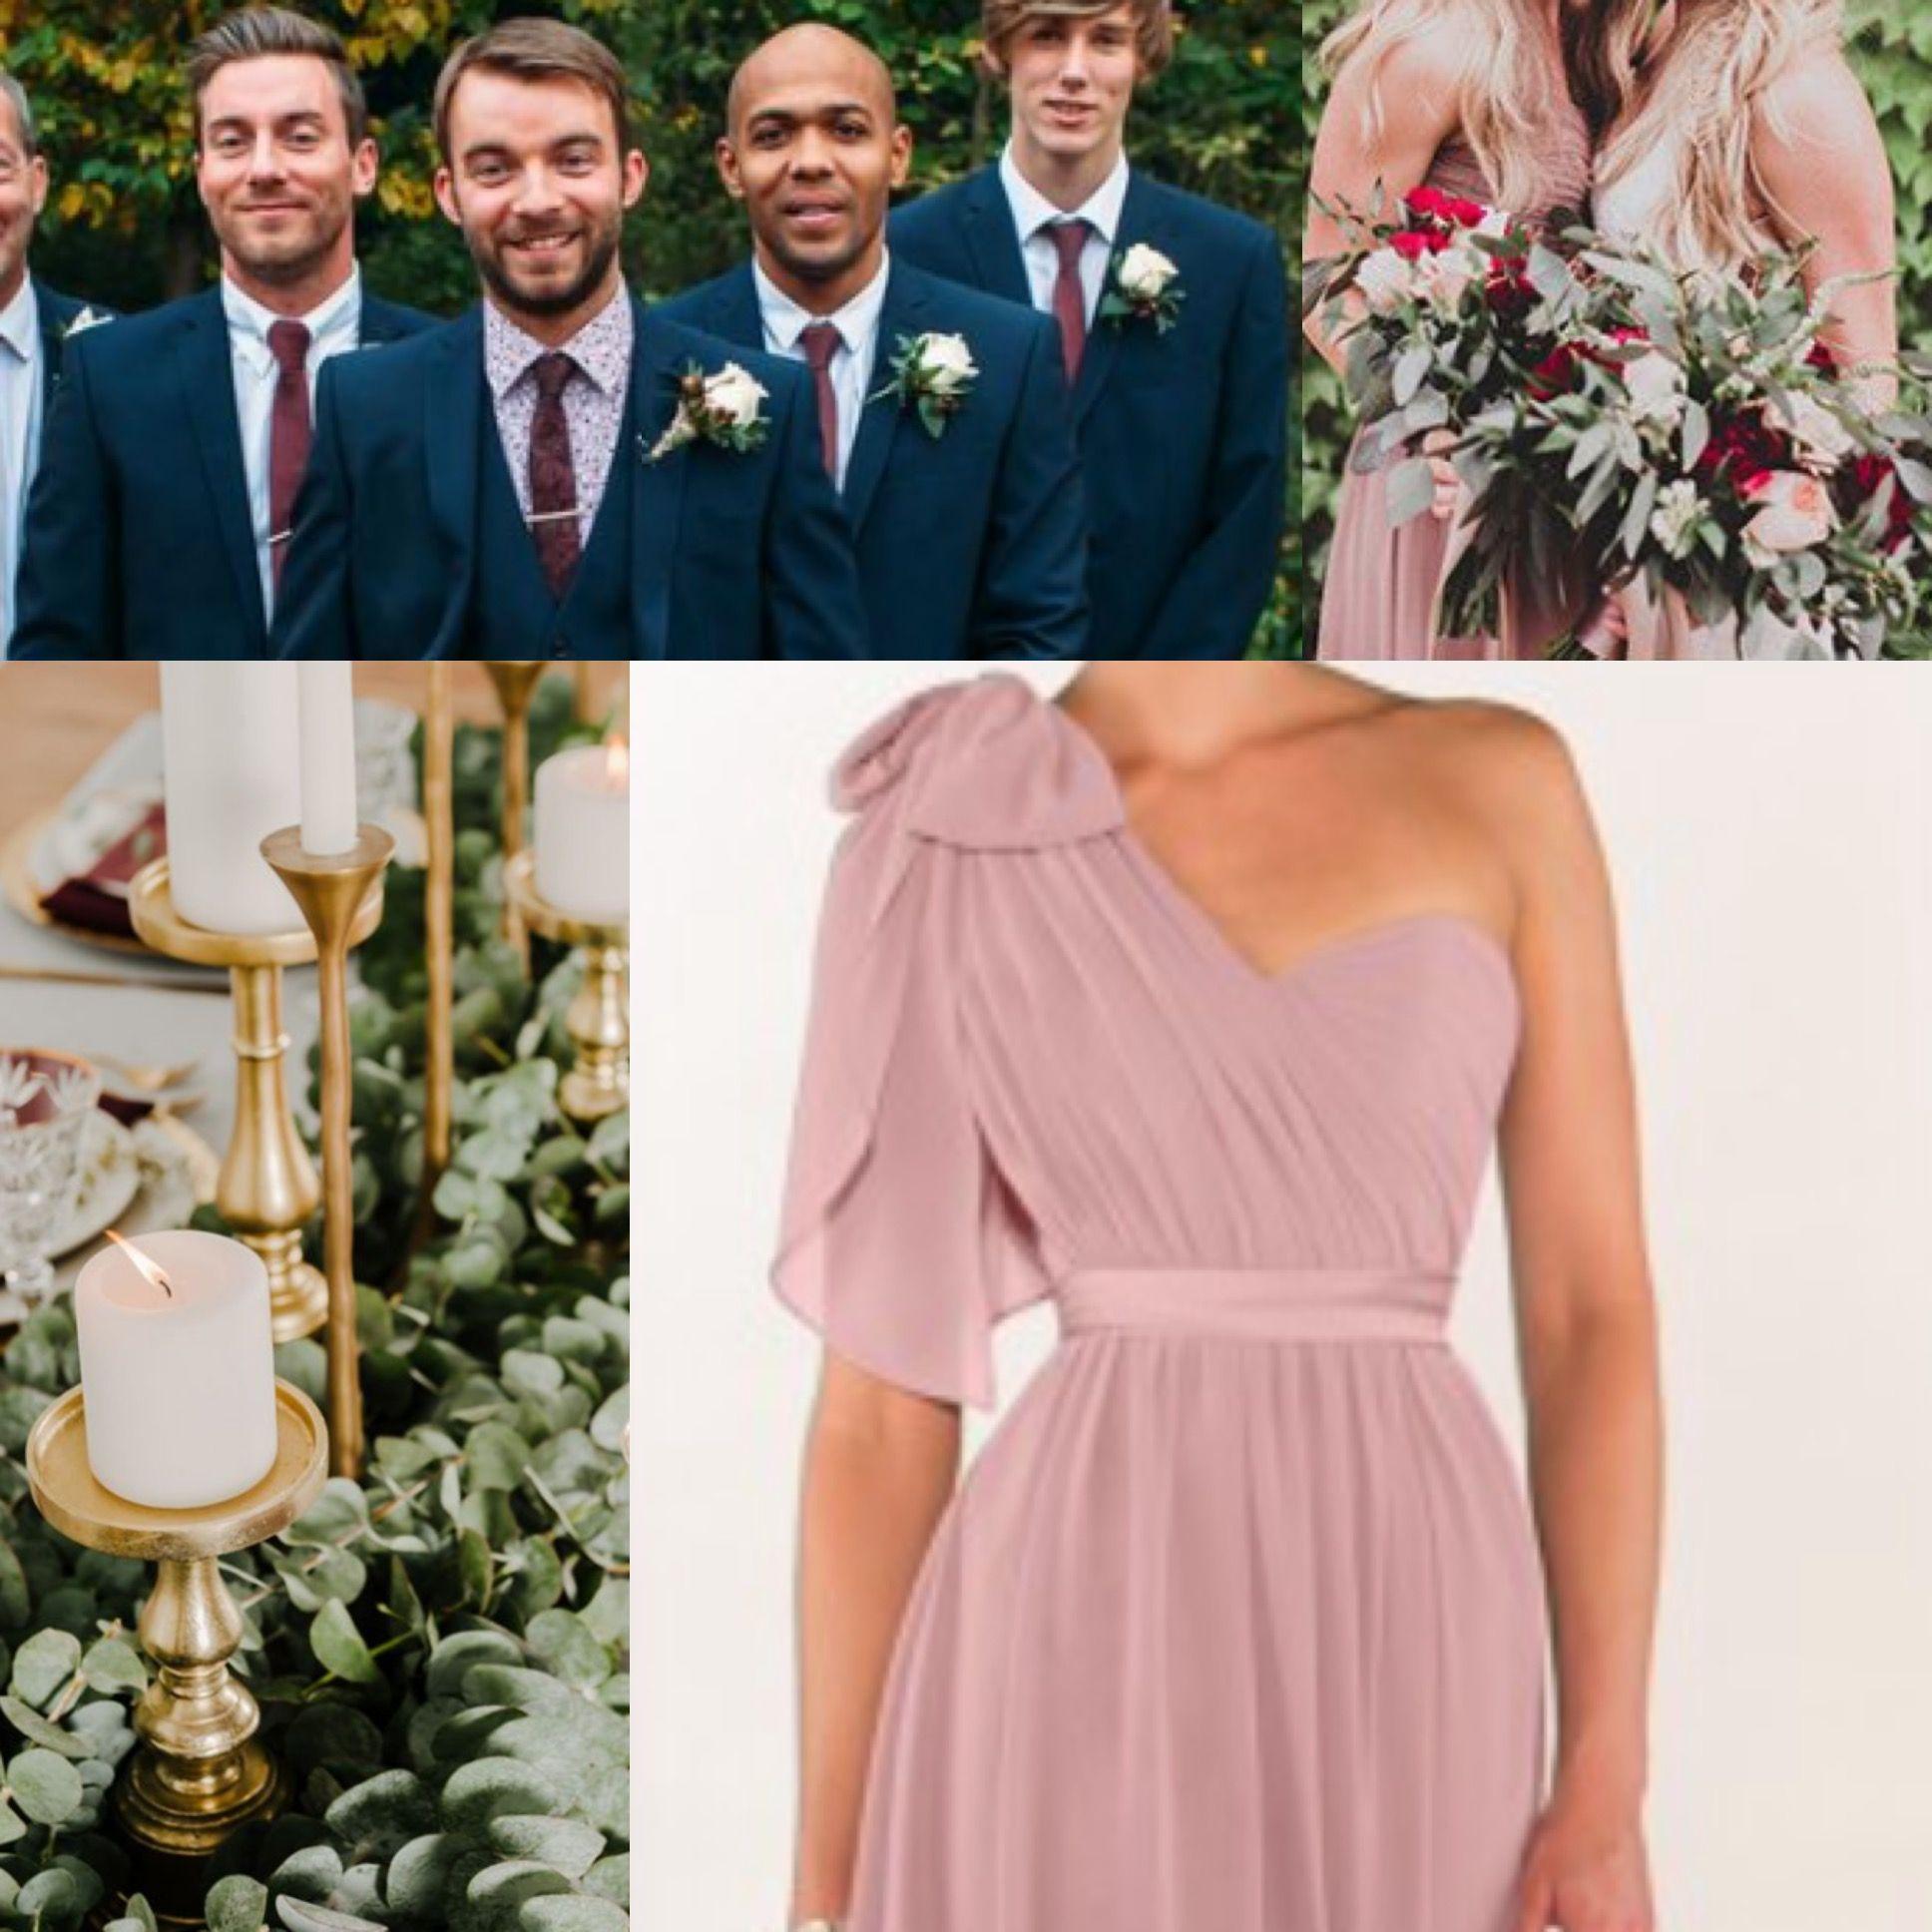 Dusty rose, marsala, navy, & gold | Roomie\'s I Do ❤ | Pinterest ...